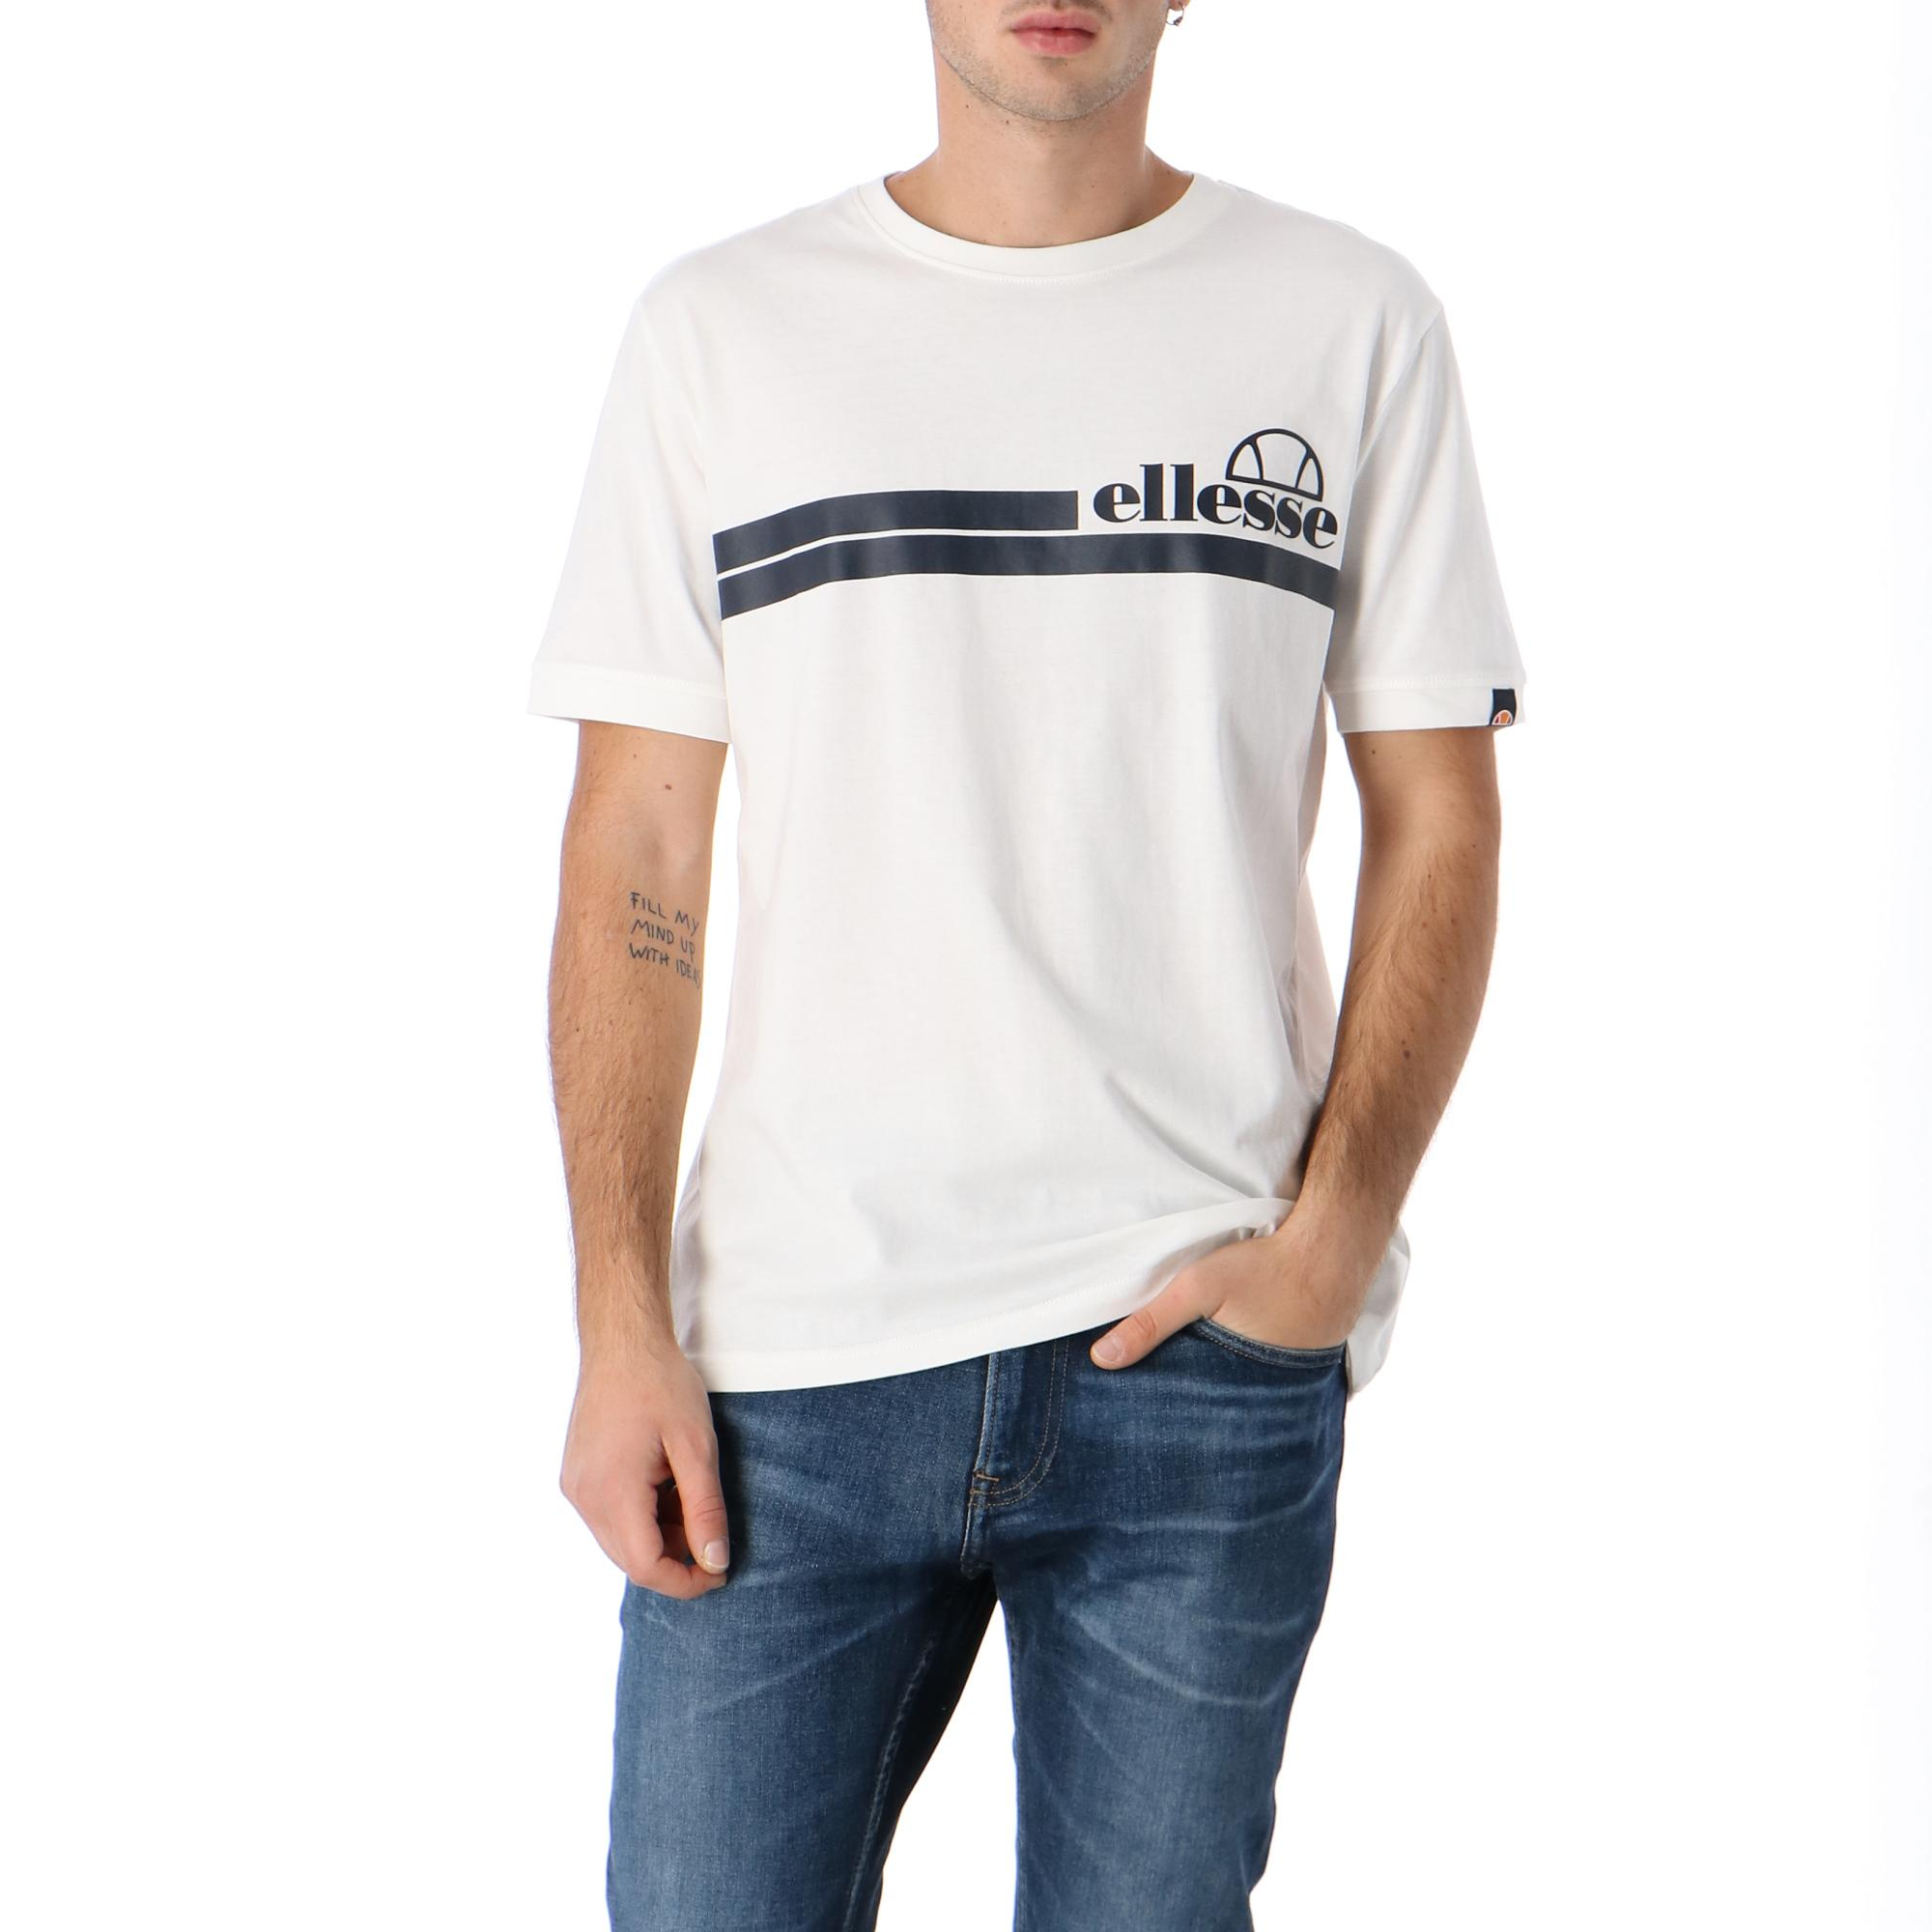 Ellesse T-shirt Ss<br/><br/> <br/> WHITE